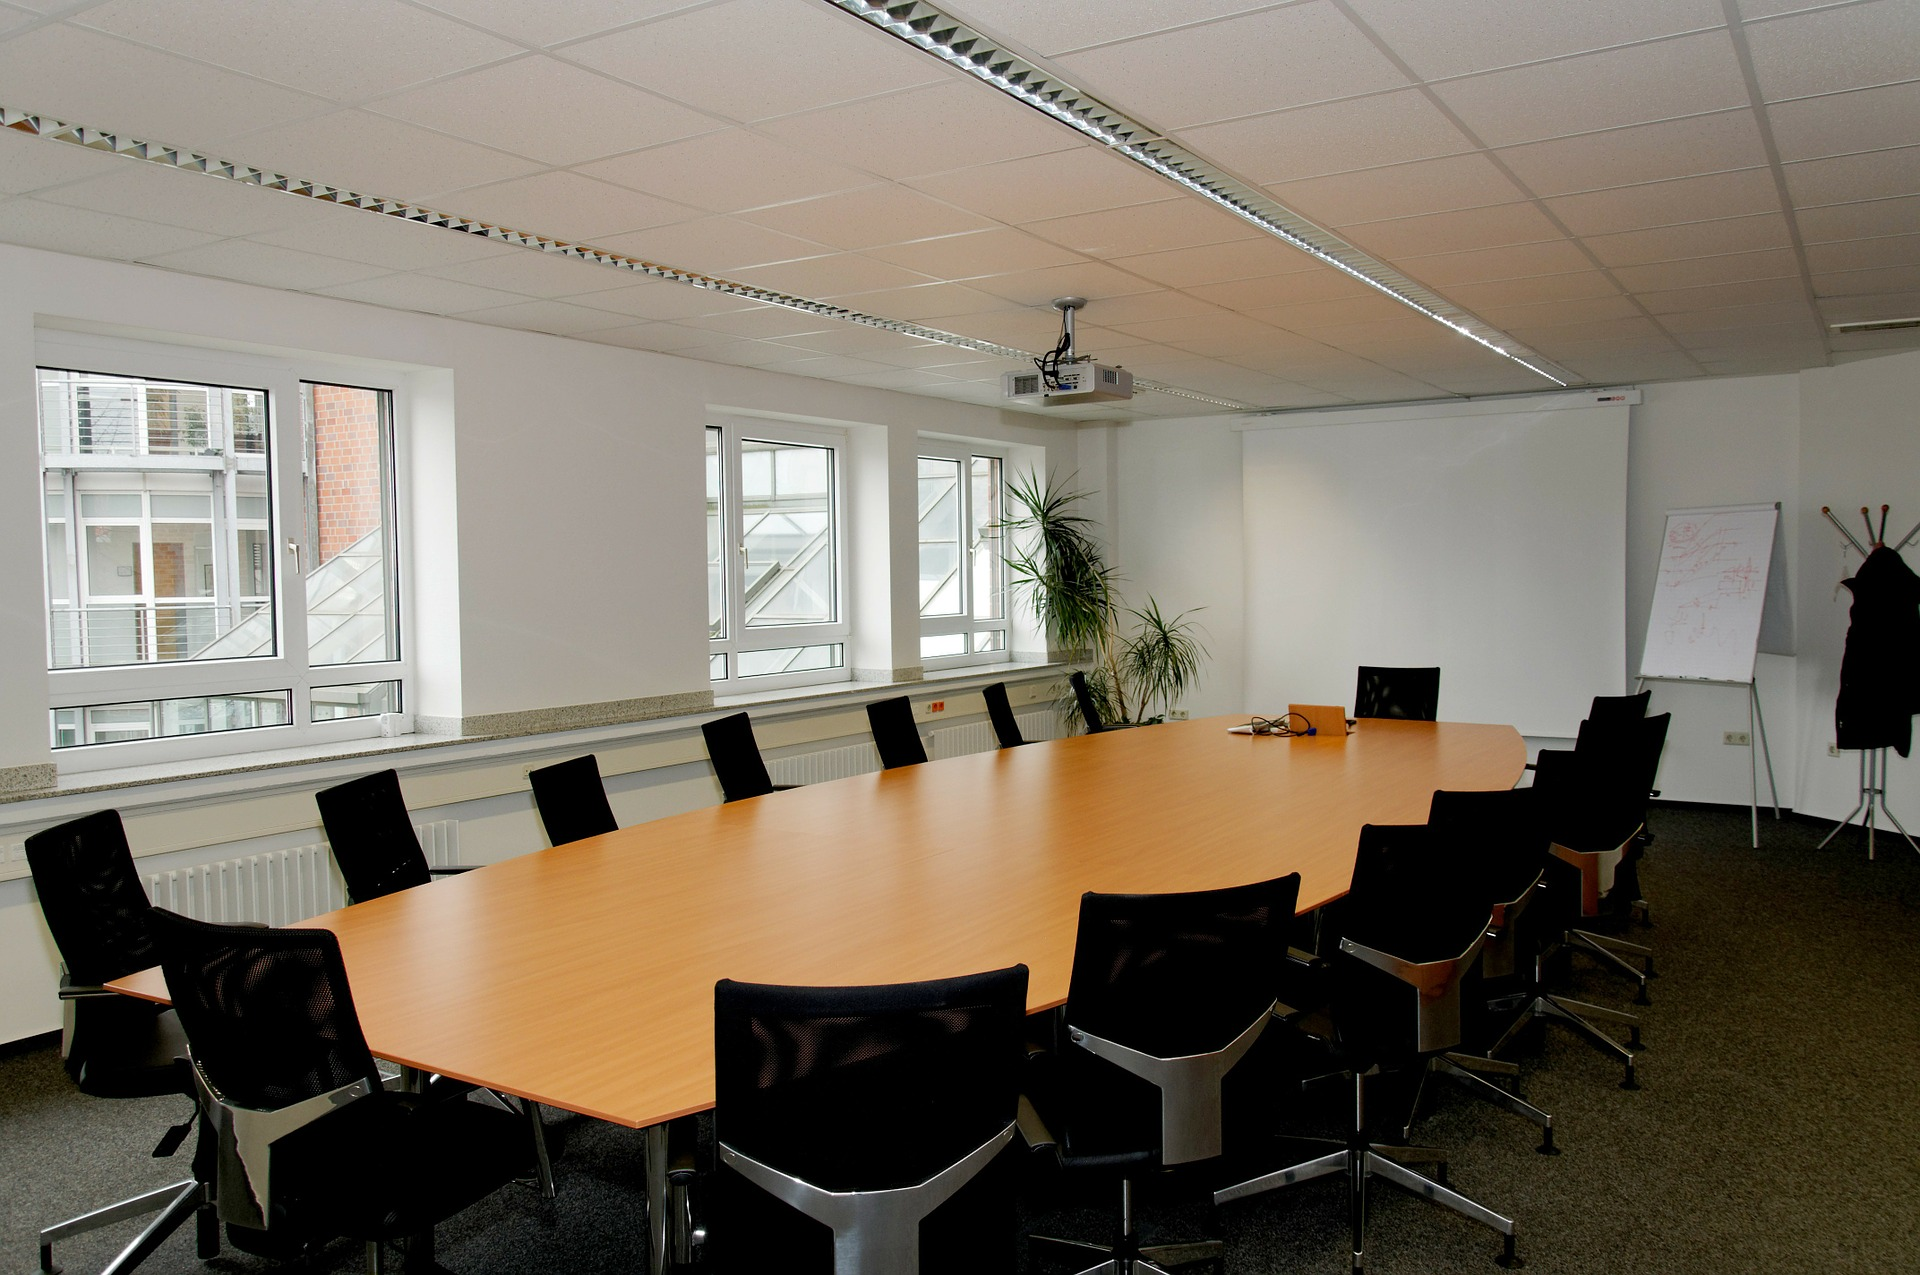 conference-room-338563_1920.jpg